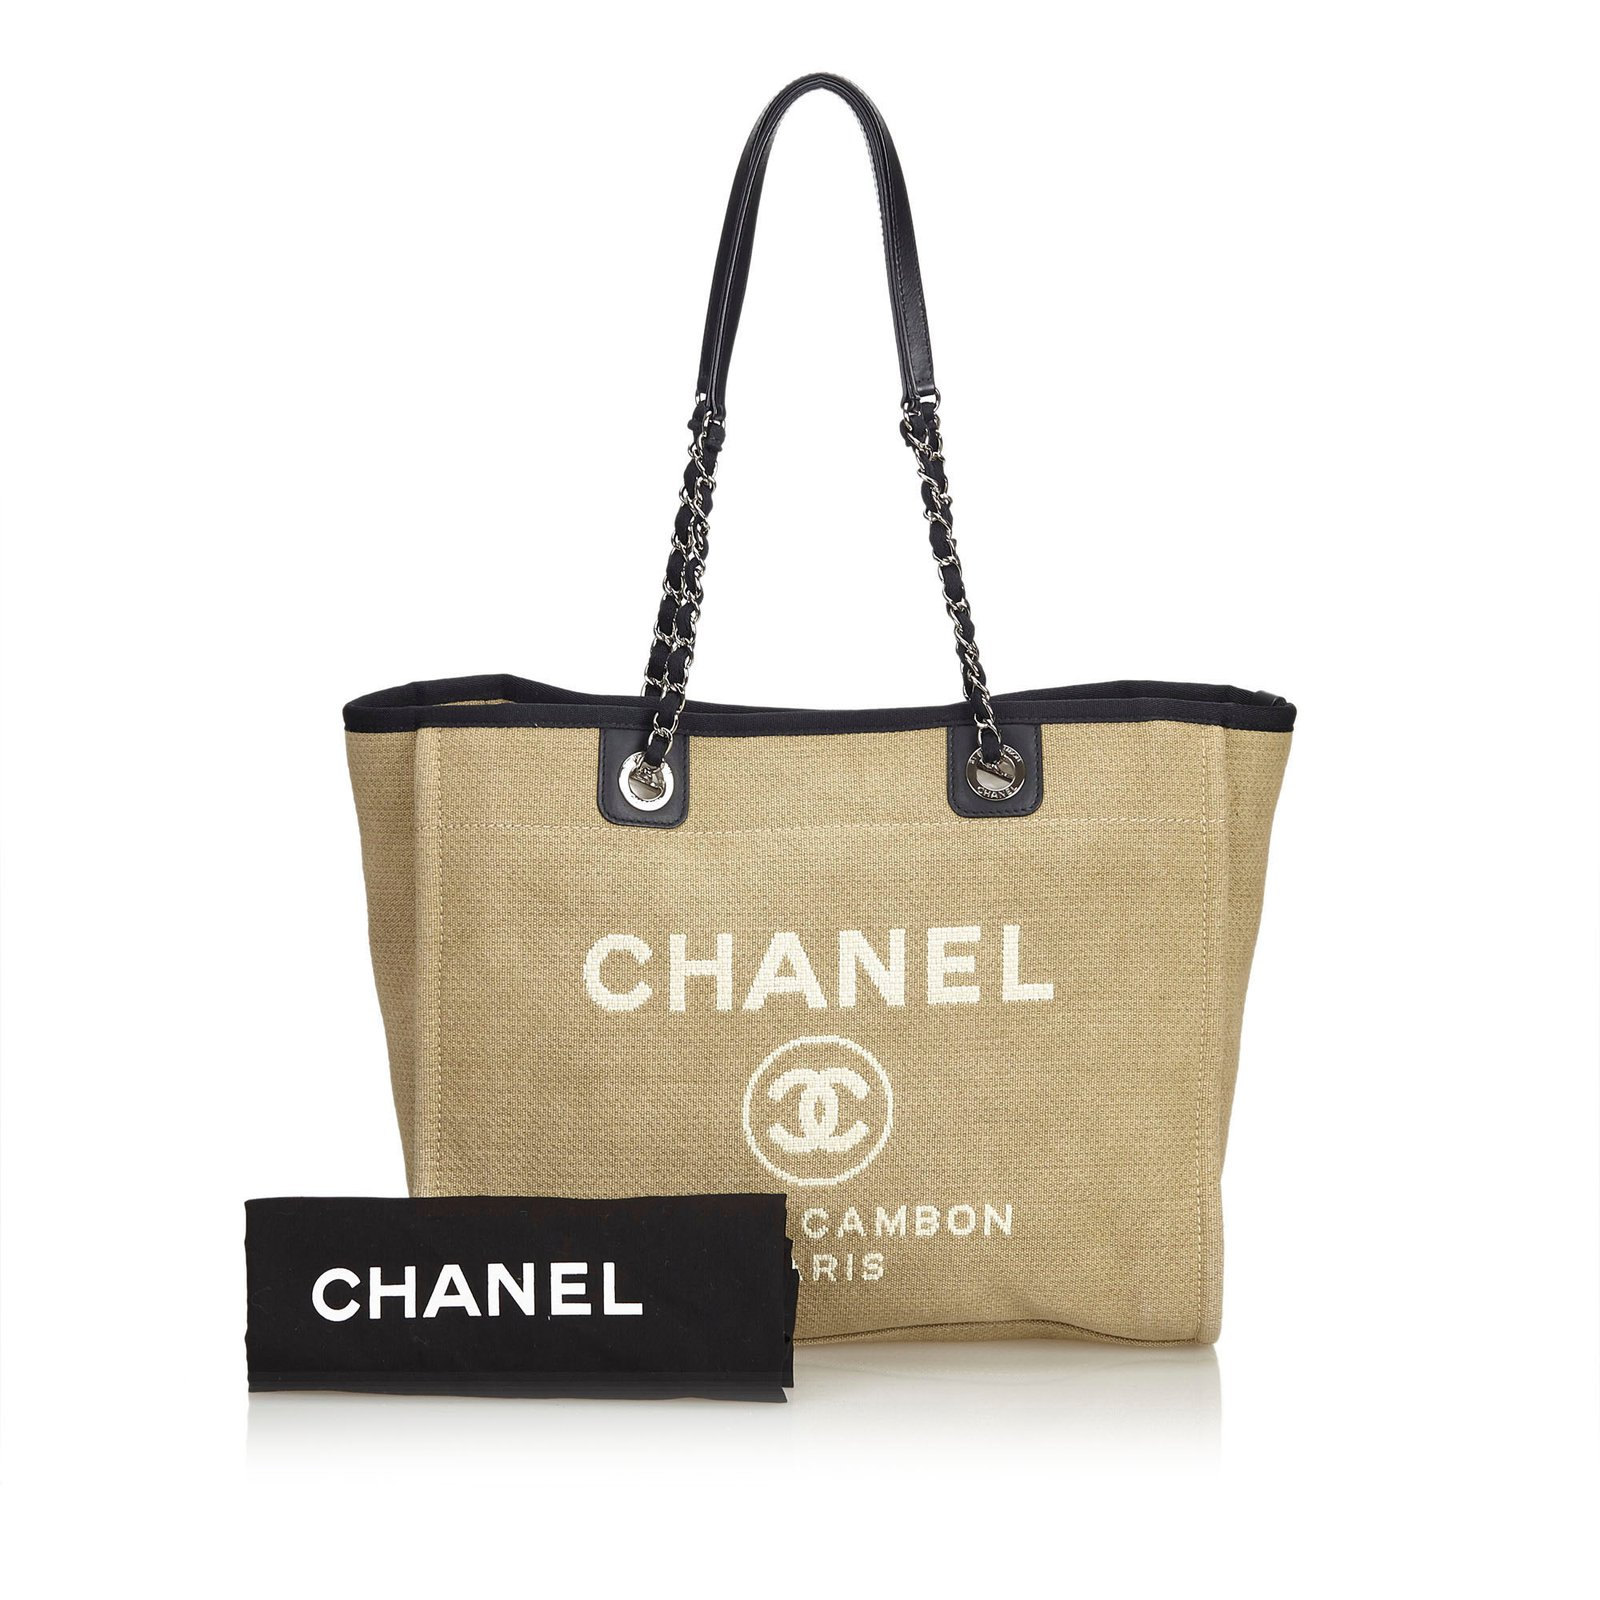 4e979ca29c3d Chanel Small Deauville Tote Totes Leather,Other,Cloth,Cloth Brown,Black, Beige ref.100780 - Joli Closet